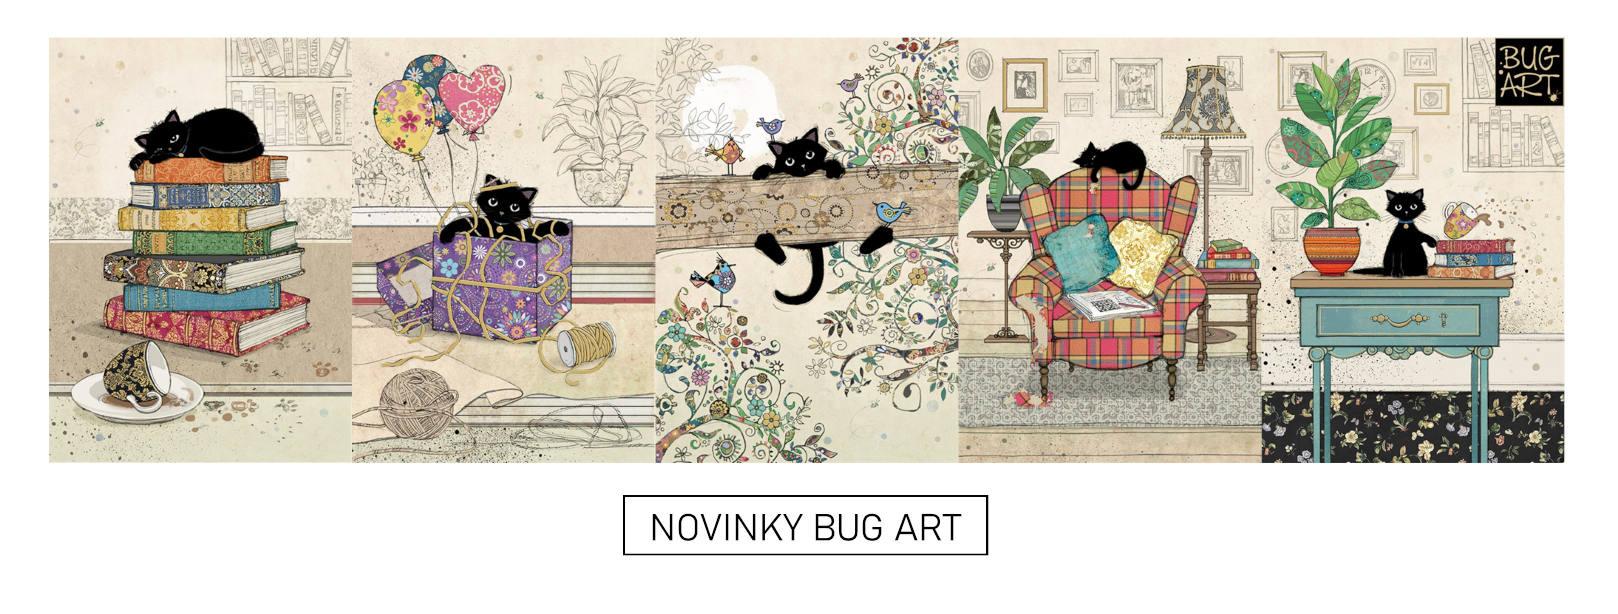 NOVNIKY BUG ART 8.2020